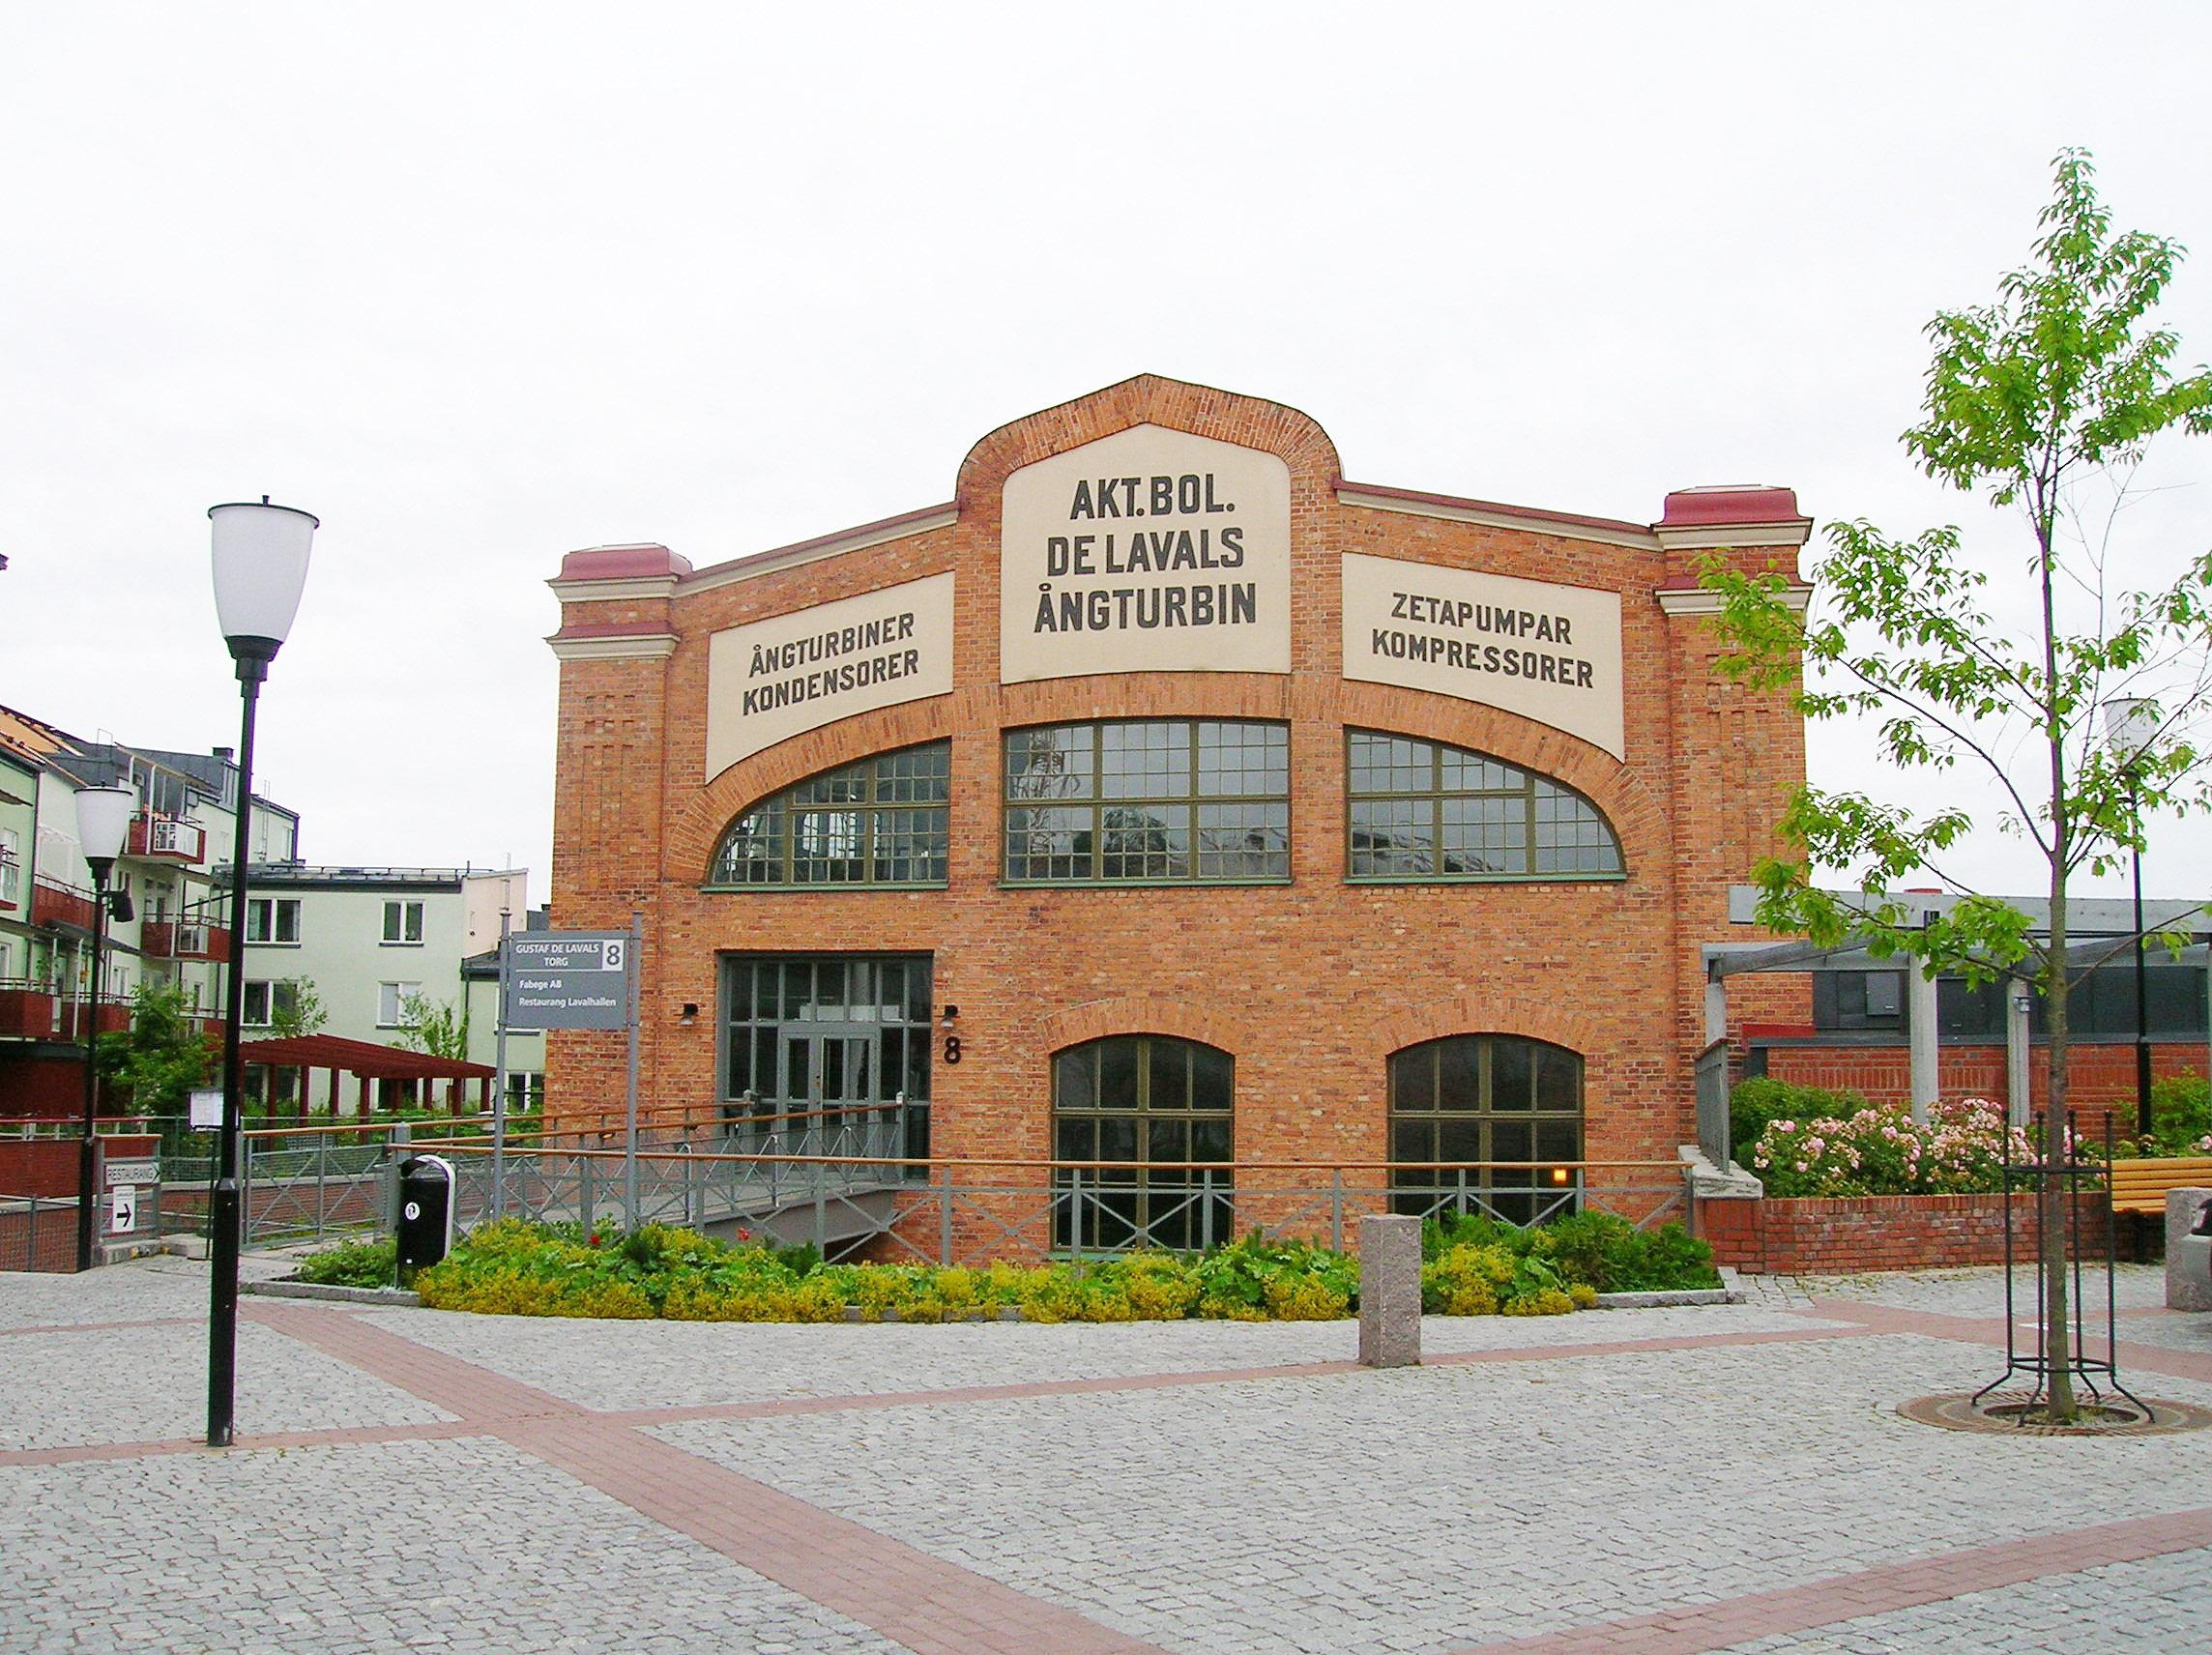 File De Lavals ¥ngturbinfabrik Järla Nacka 2005 07 31